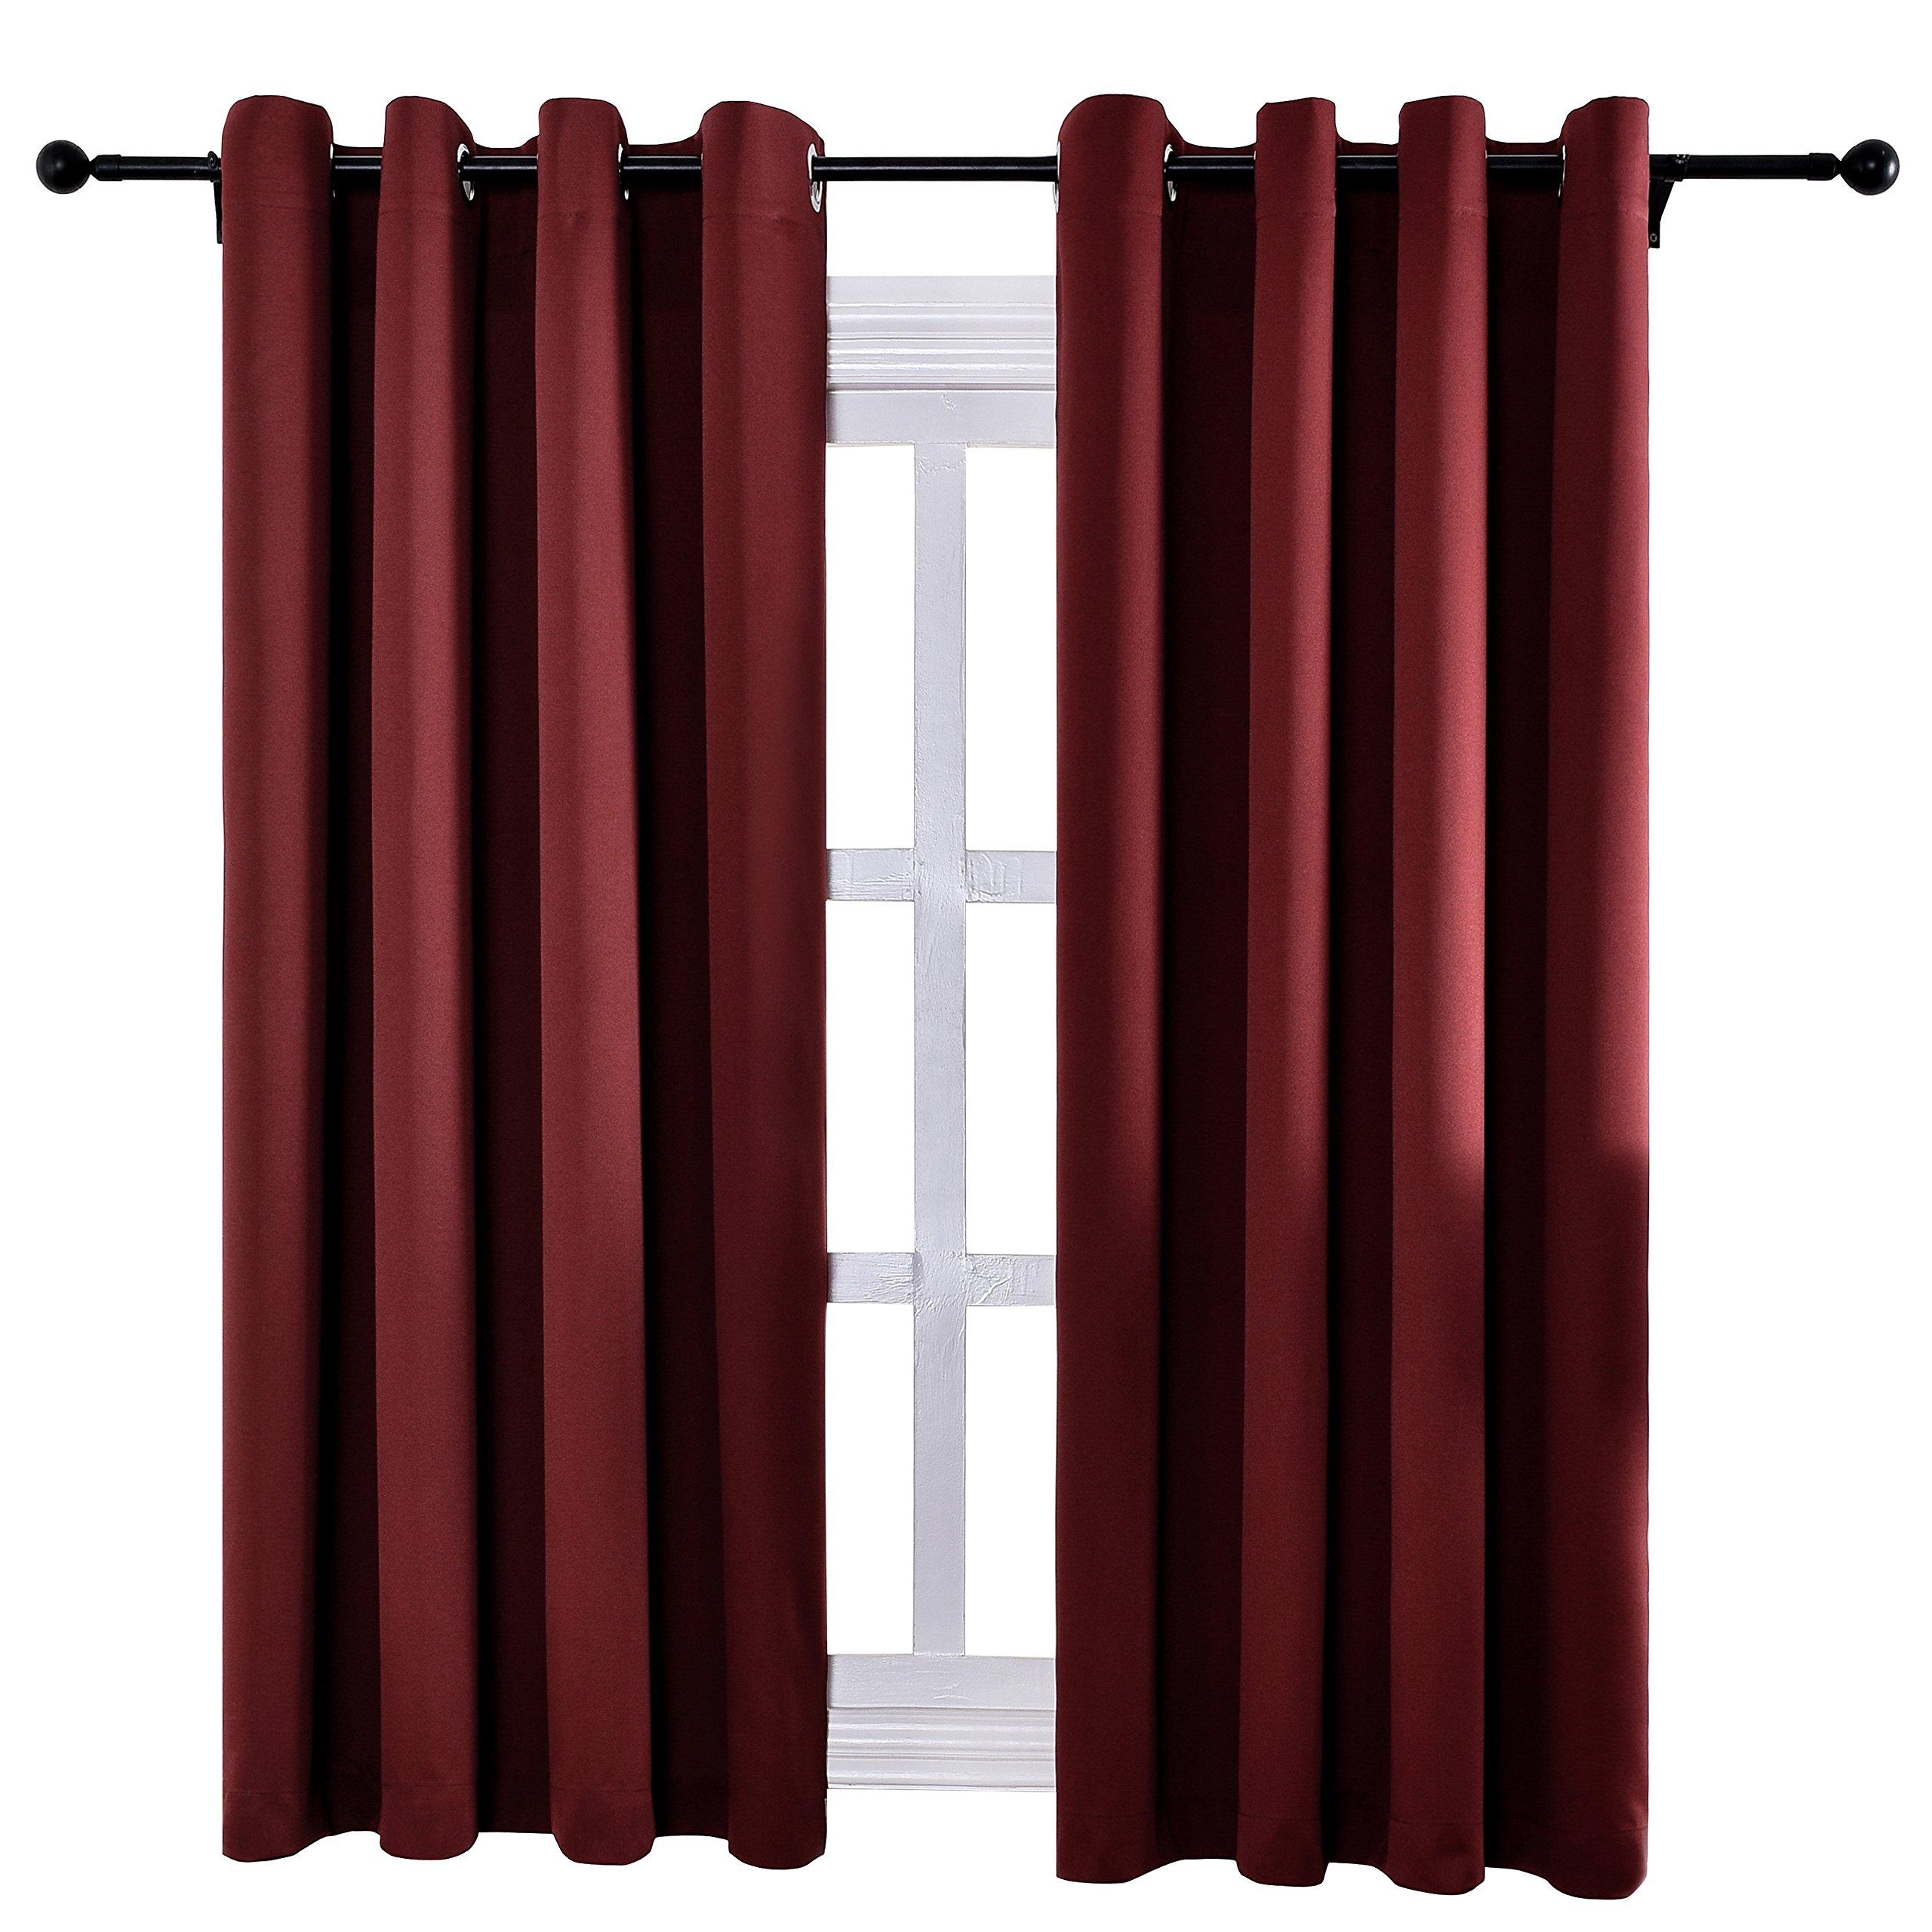 Keqiaosuocai Room Darkening Blackout Curtains Flame